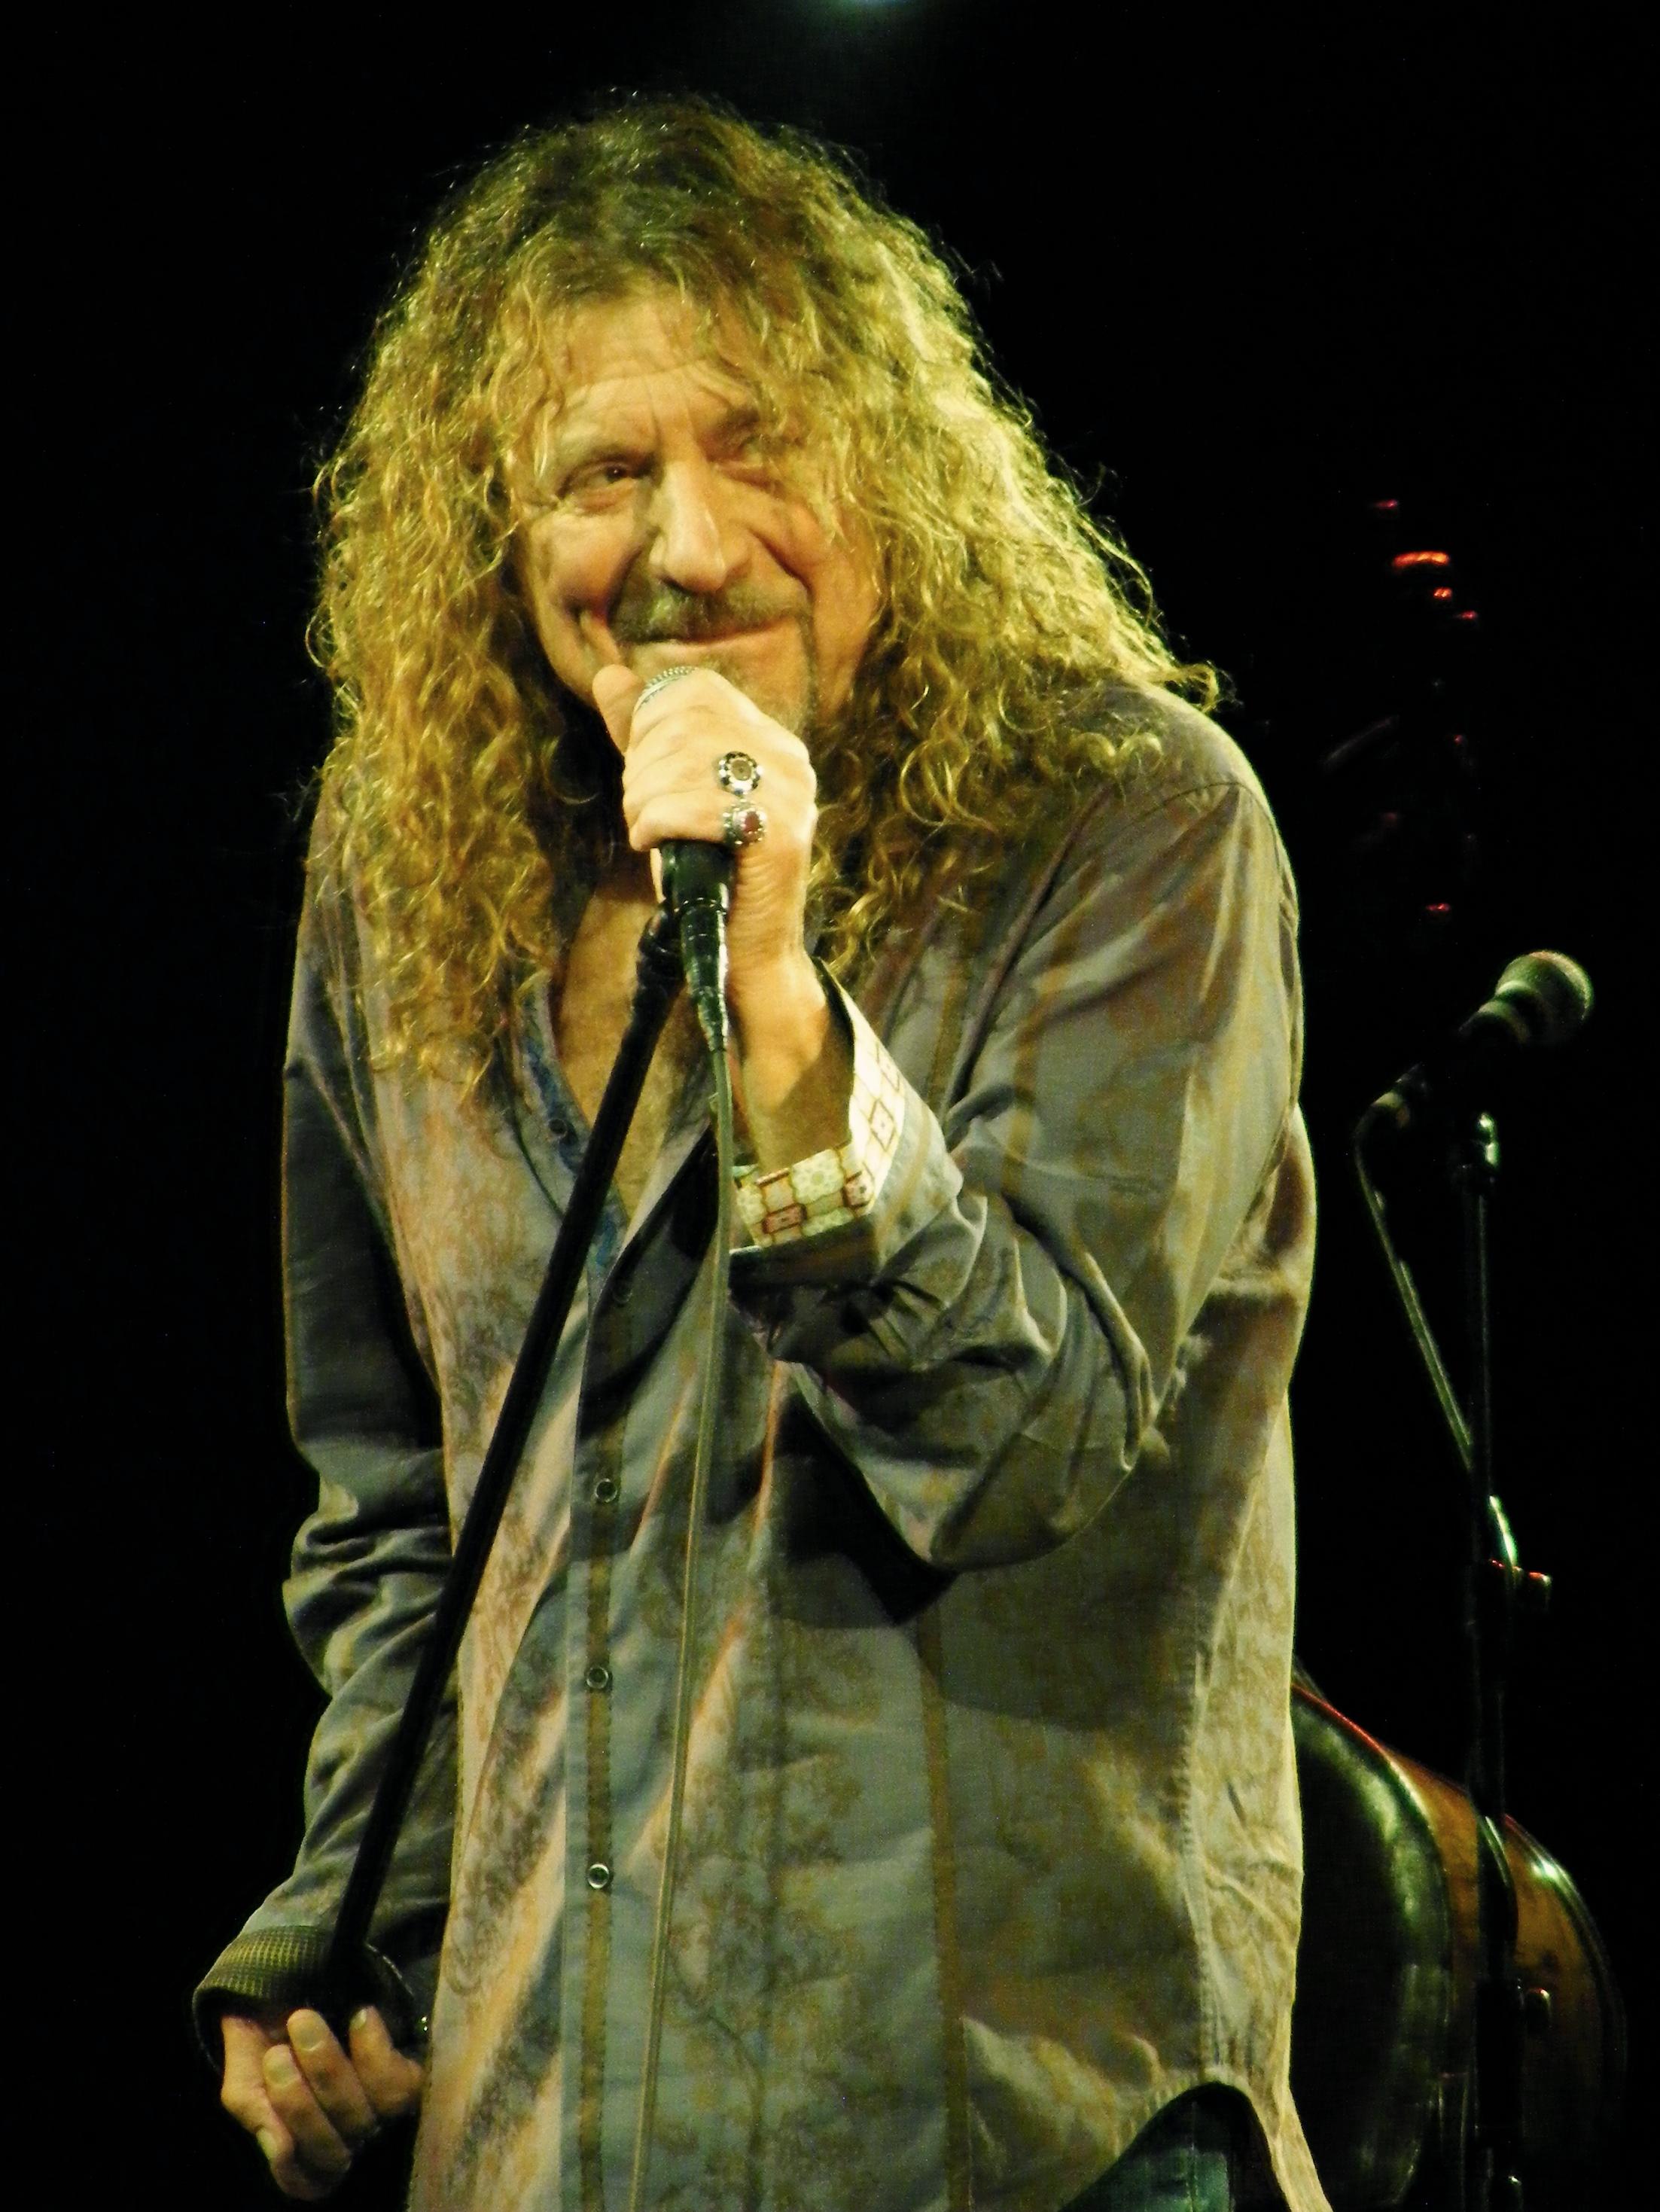 Robert Plant - Wikipedia